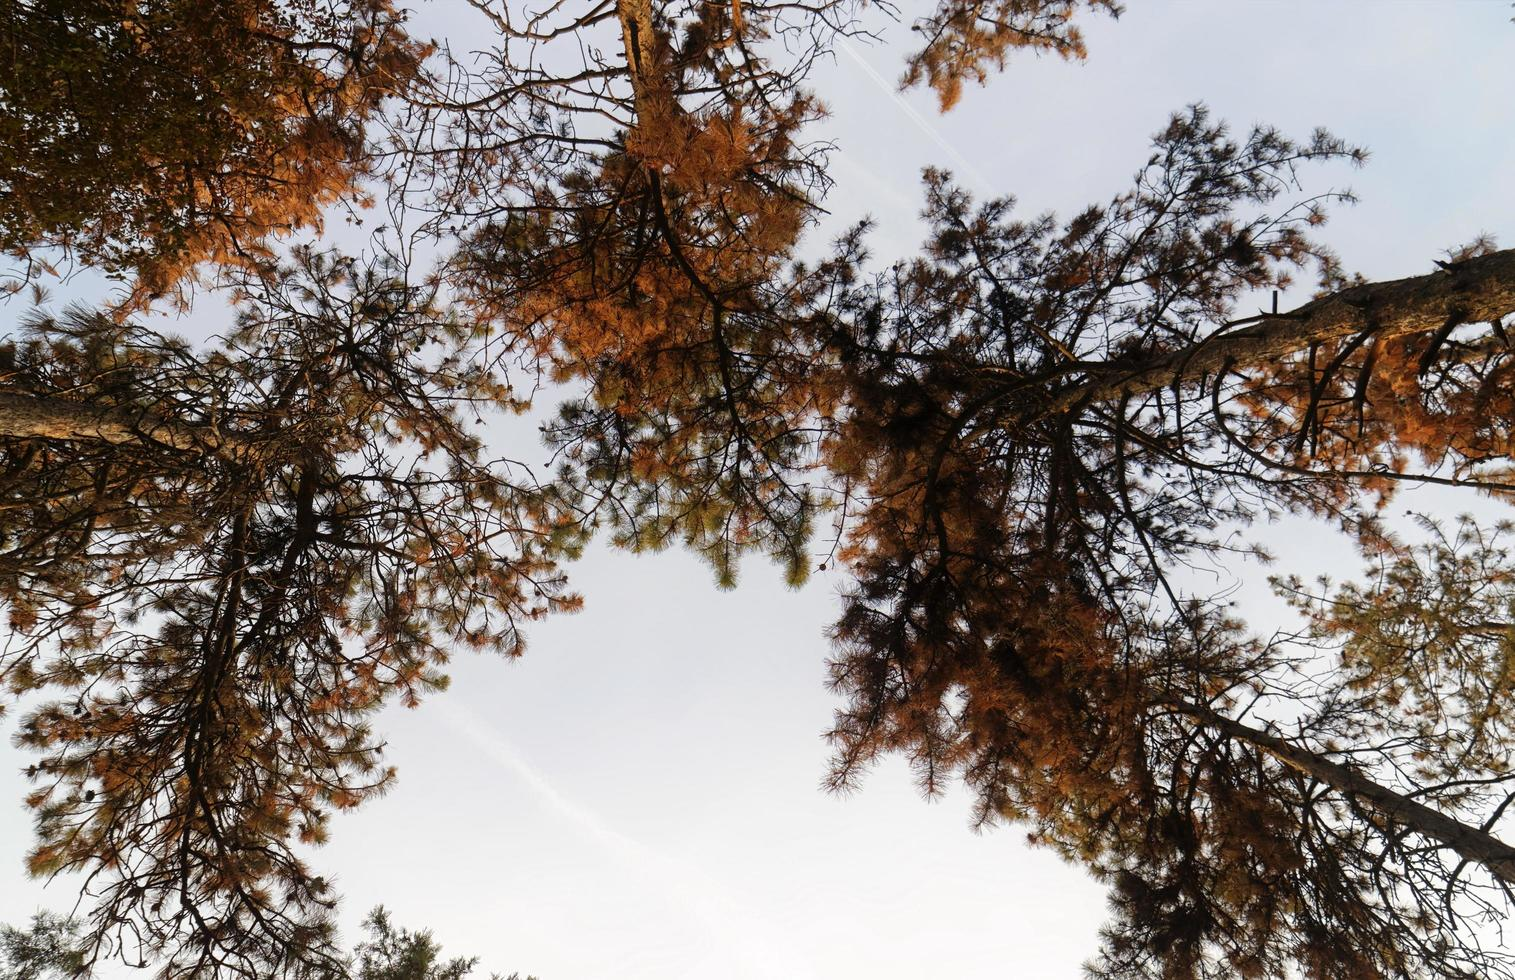 bosbomen in de herfst foto